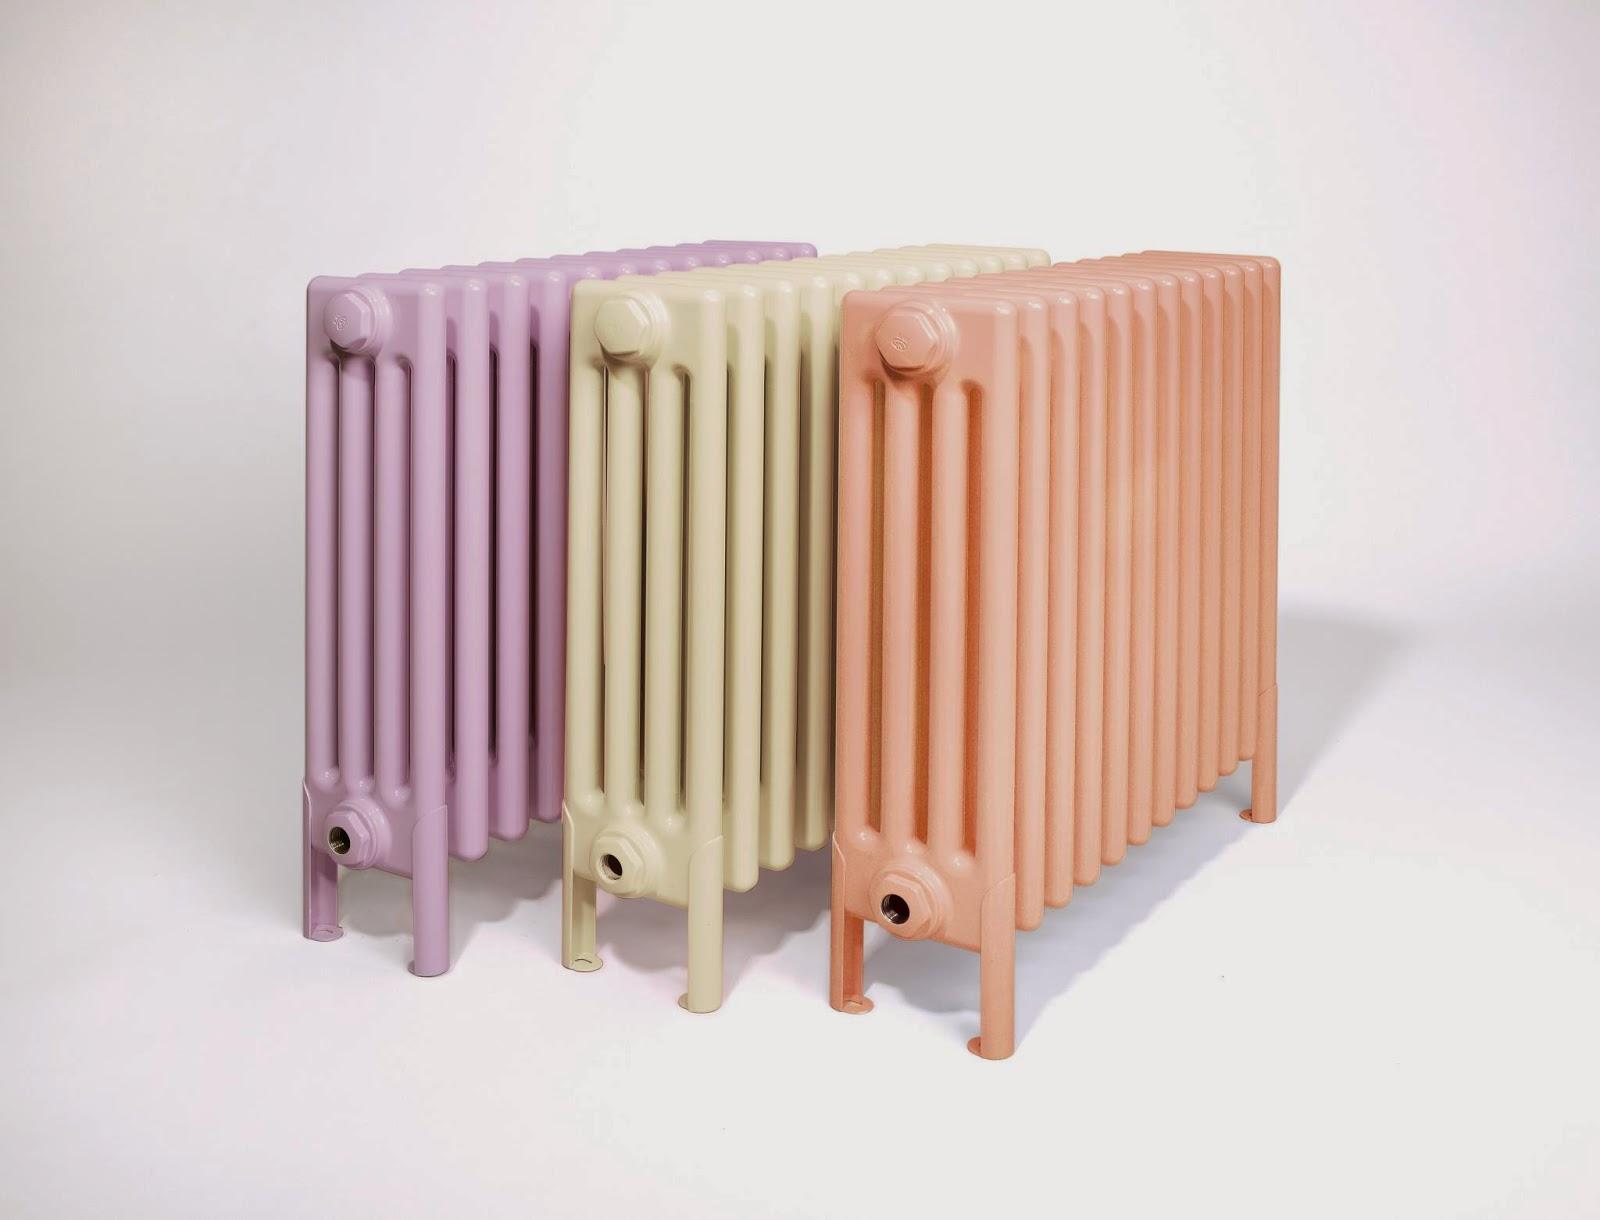 lisa melvin bisque radiator